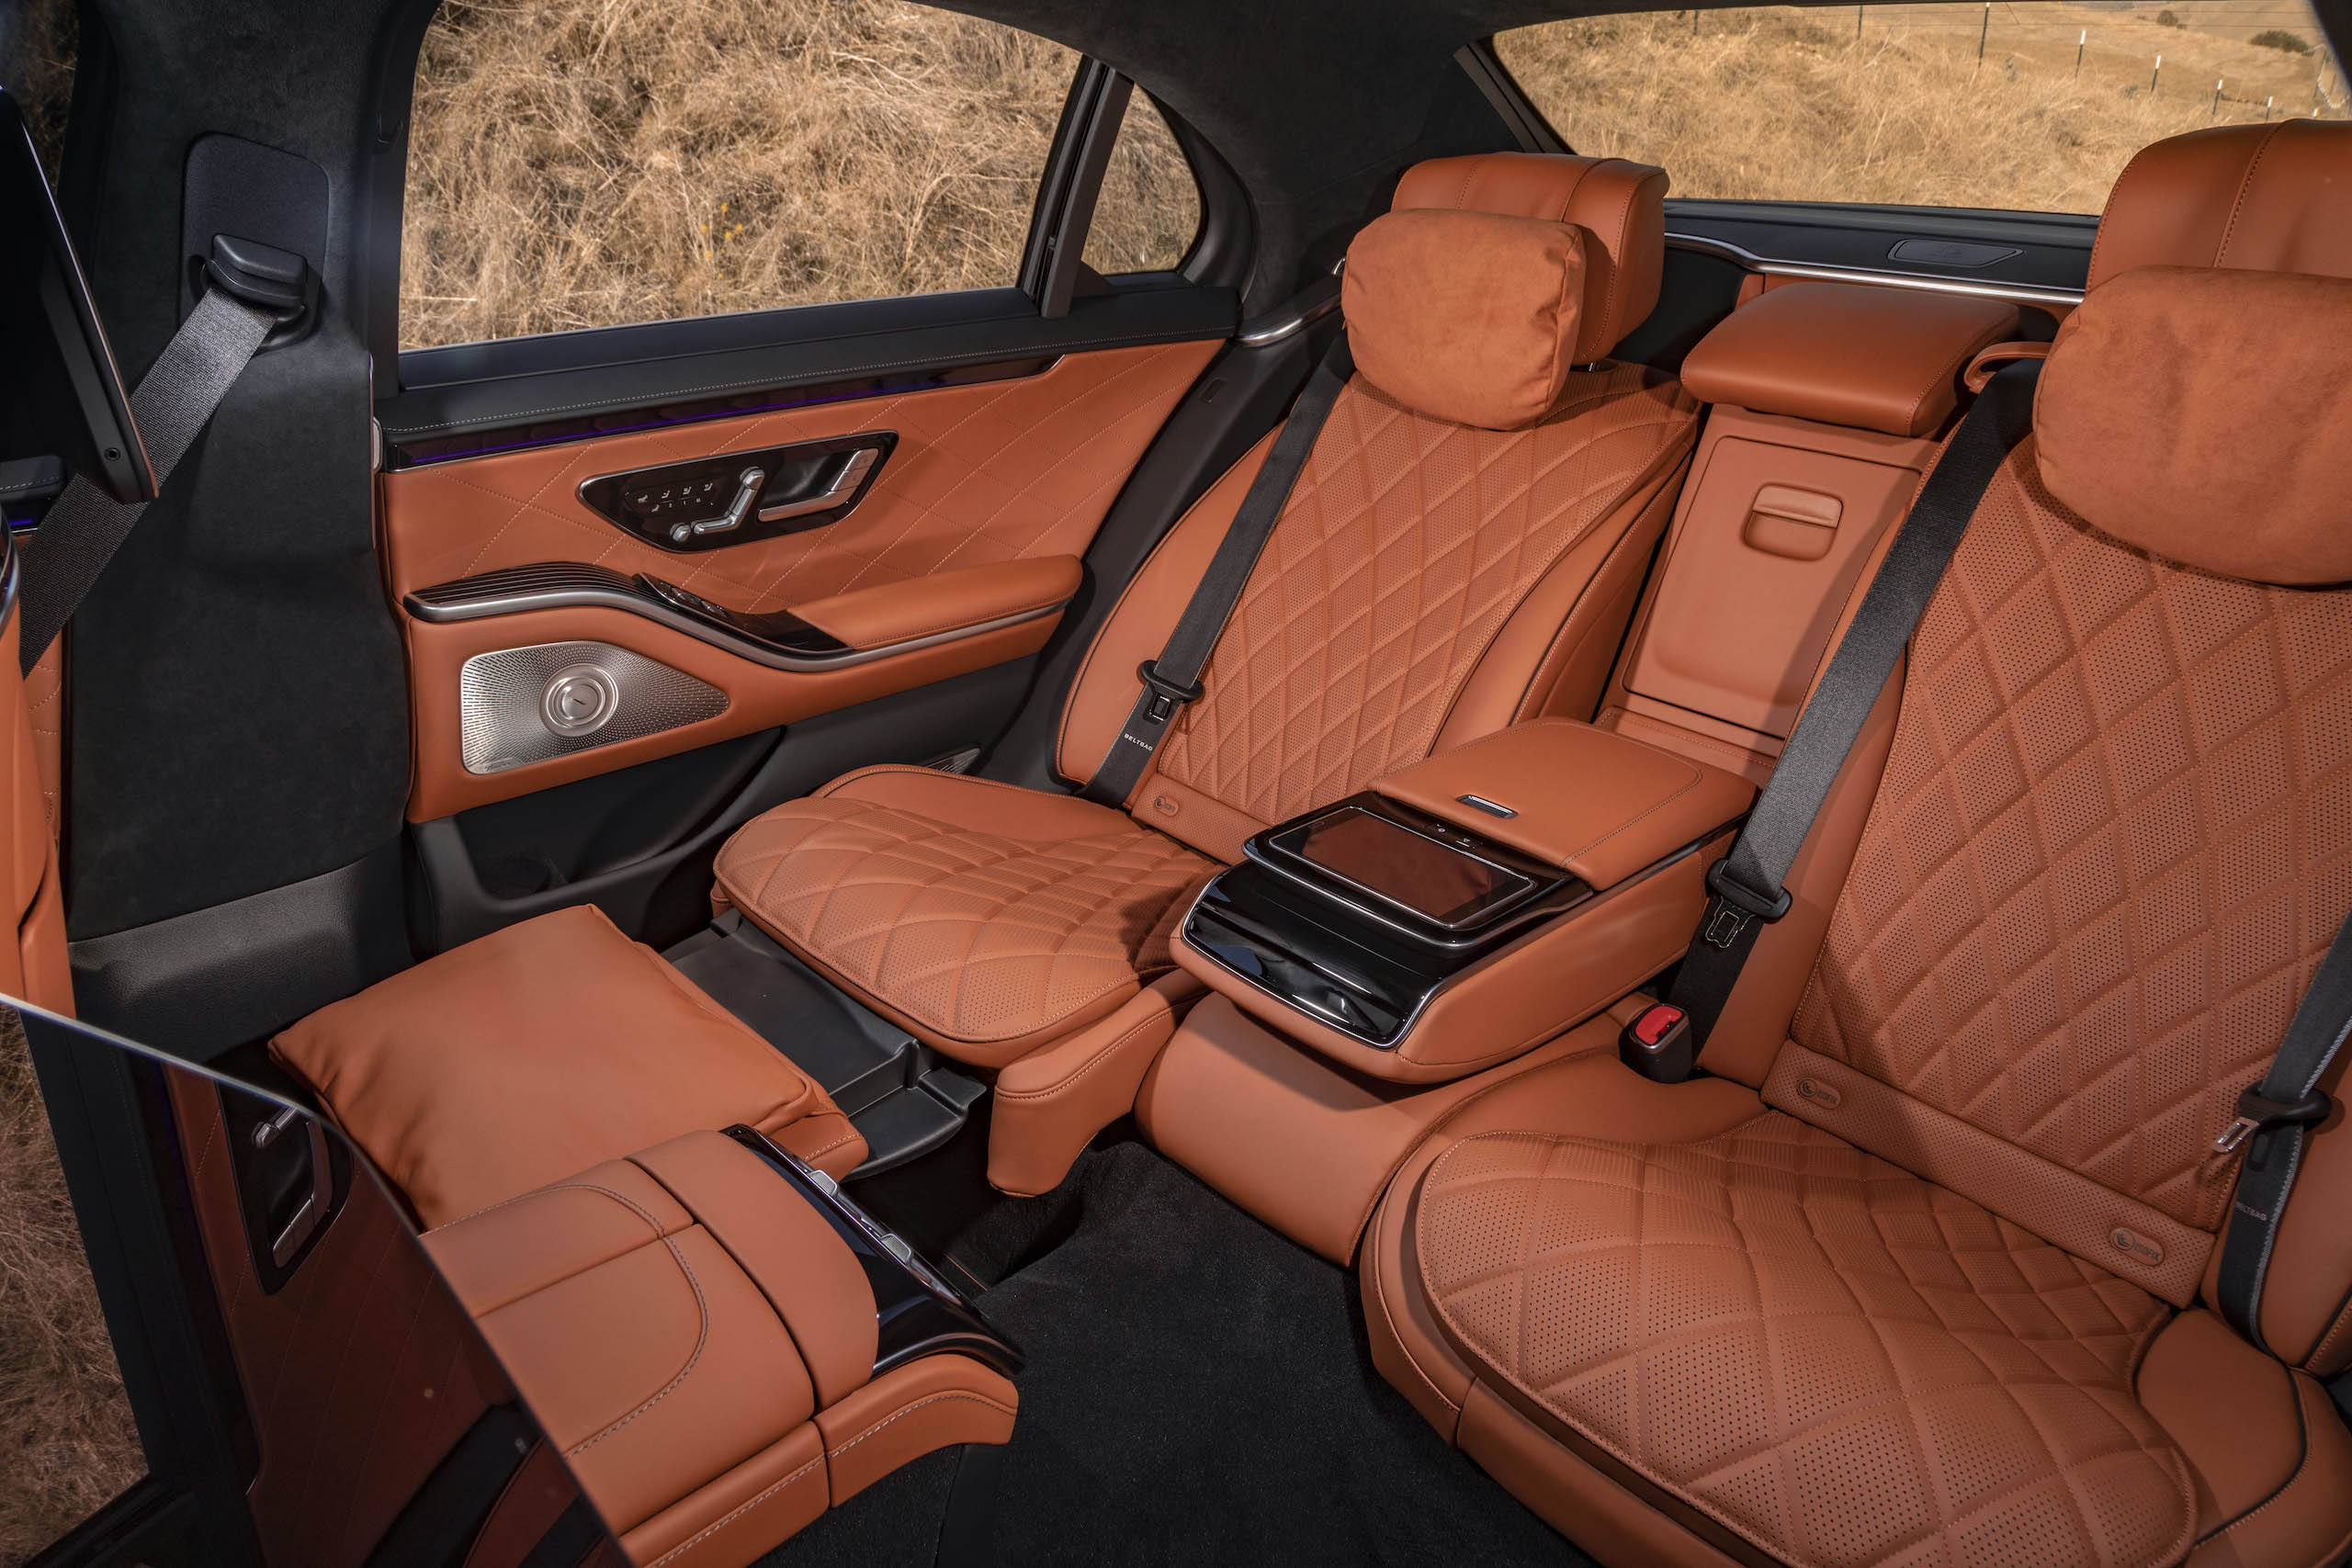 Mercedes Benz-S-Class interior rear seat